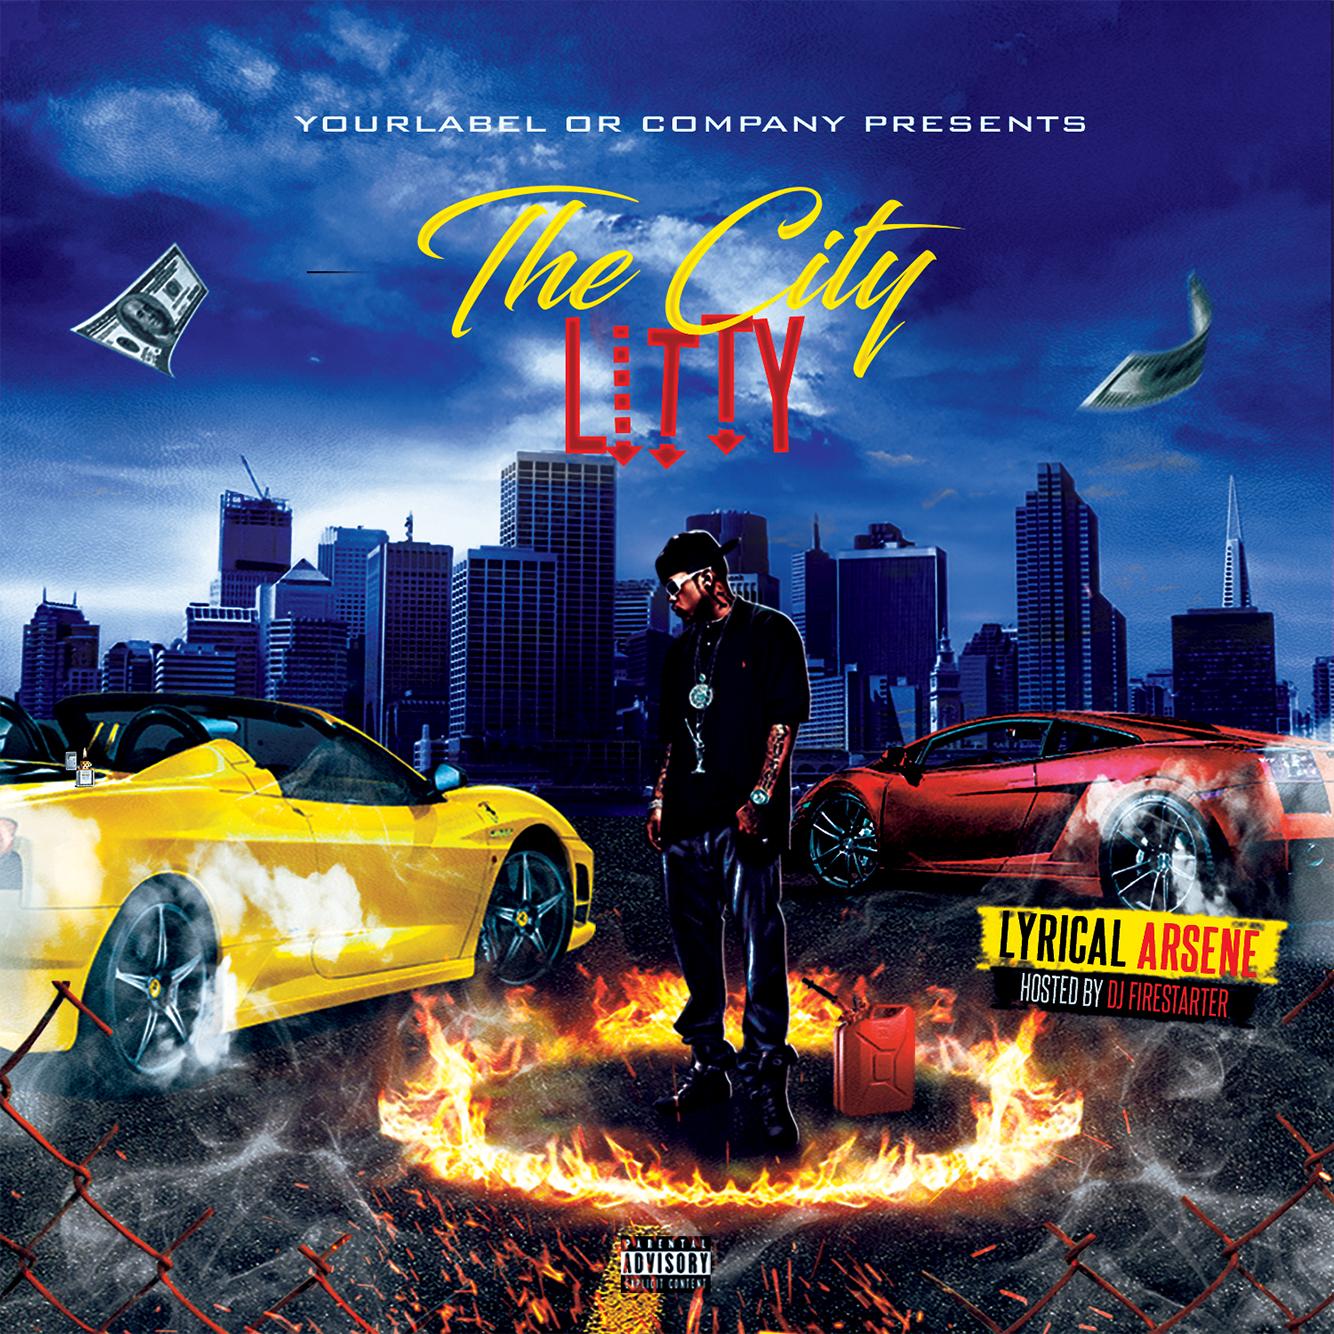 The City Litty Mixtape Cover Template Mixtapecovers Net